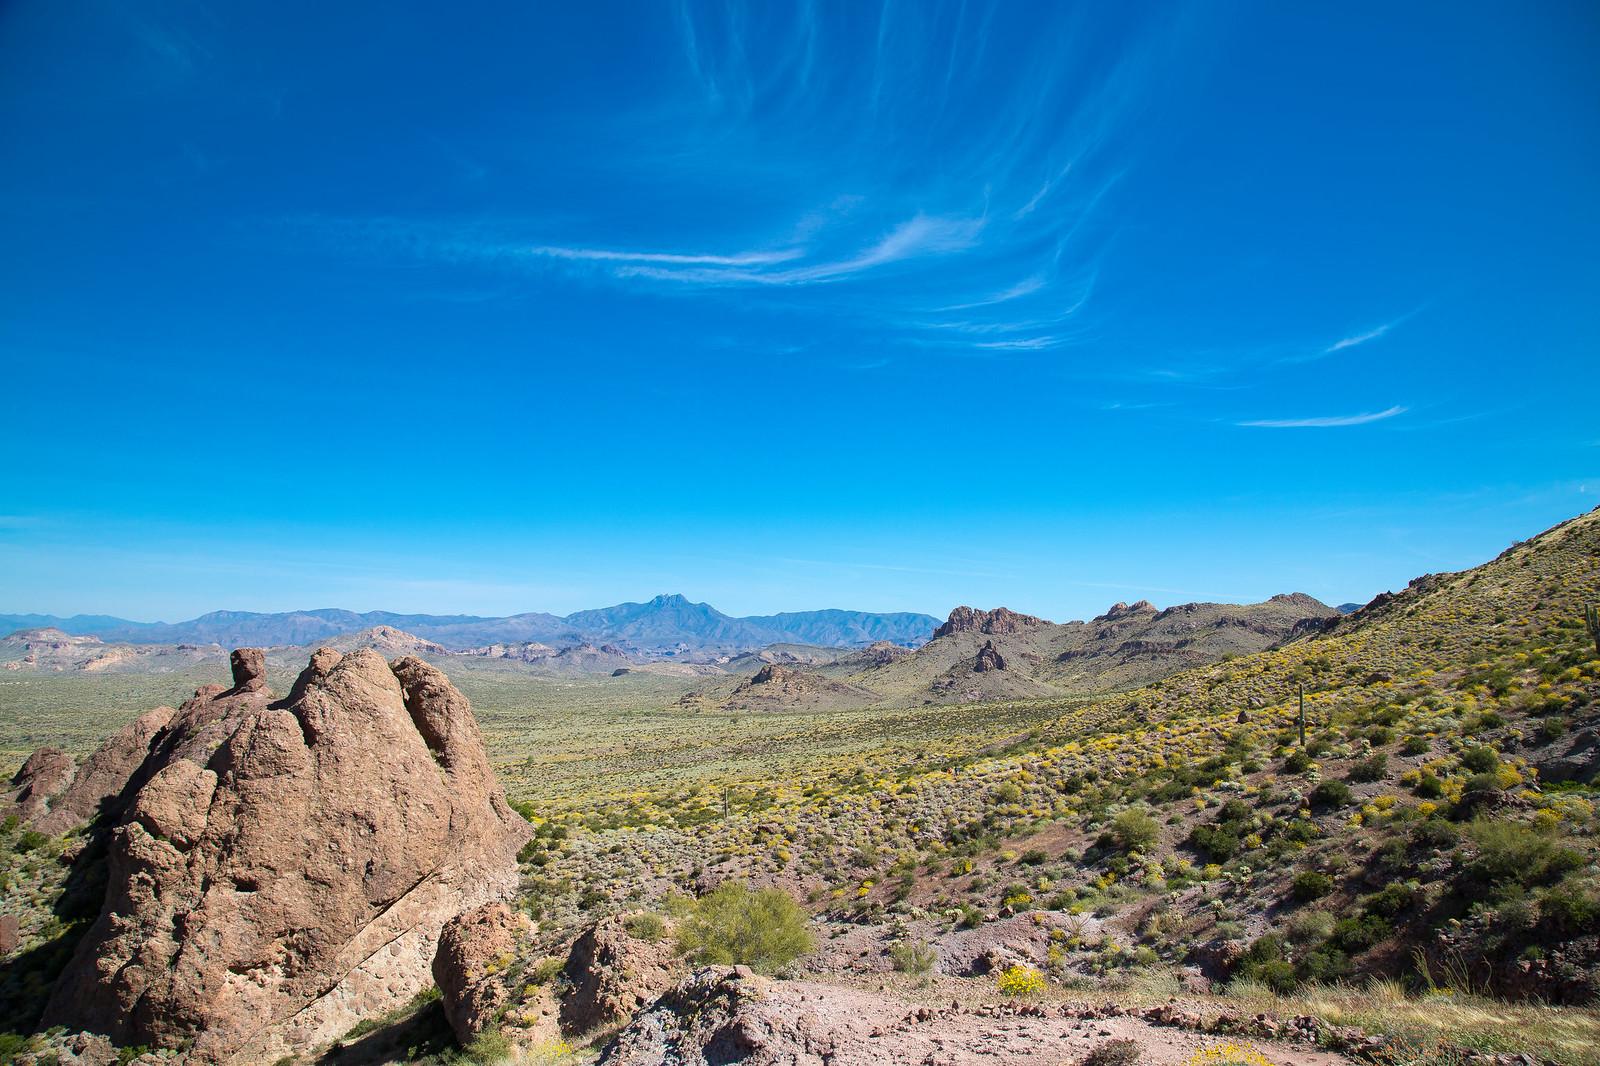 2015-03-12 Arizona-6428.jpg